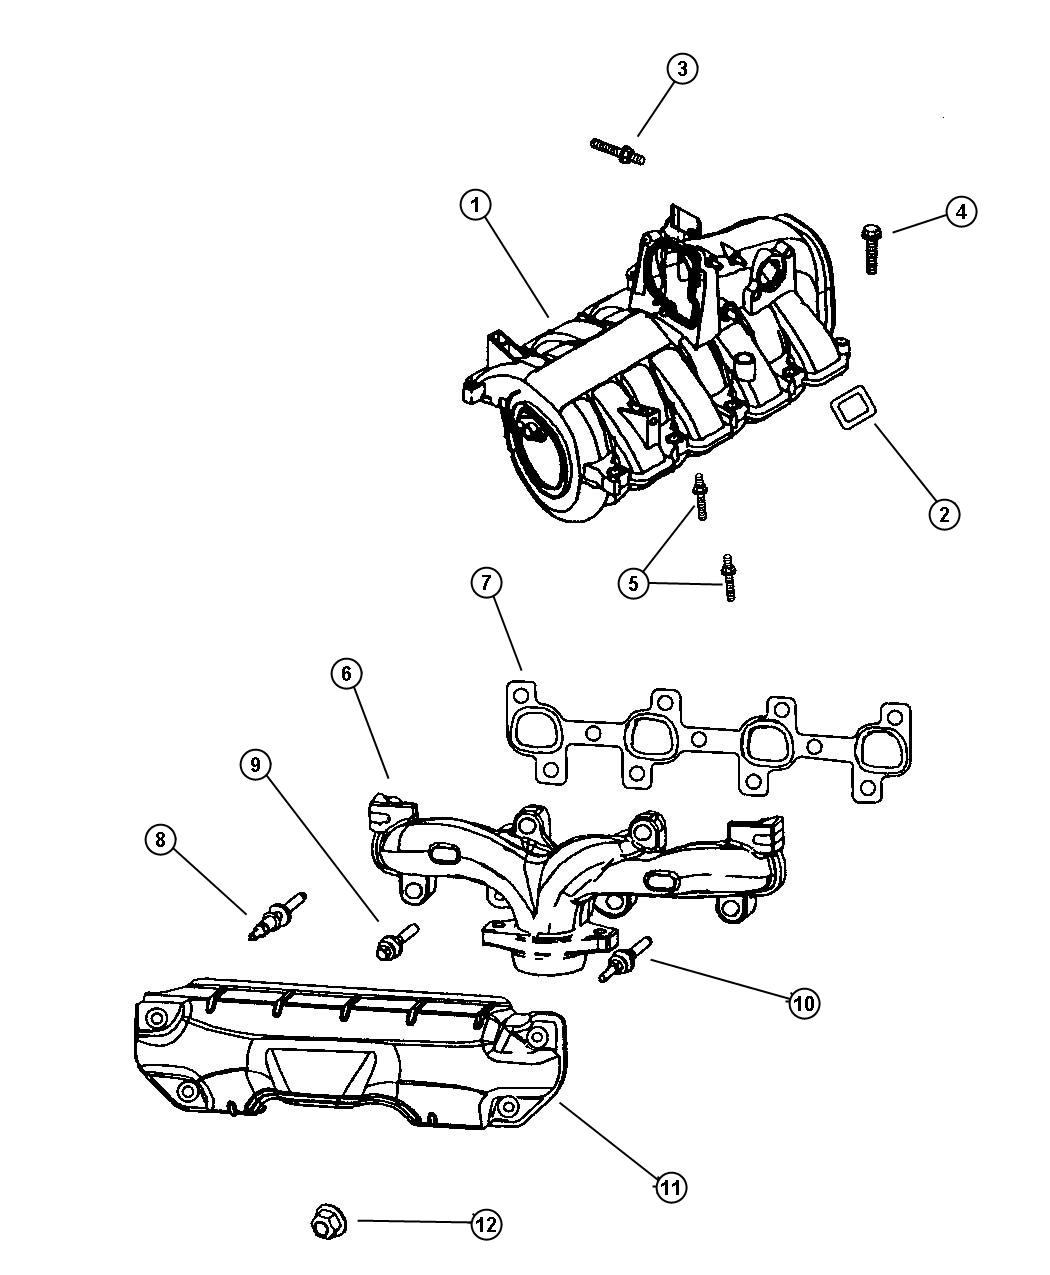 hight resolution of 2004 dodge dakota vacuum line diagram intake manifold smart wiring 1997 dodge dakota engine diagram 2004